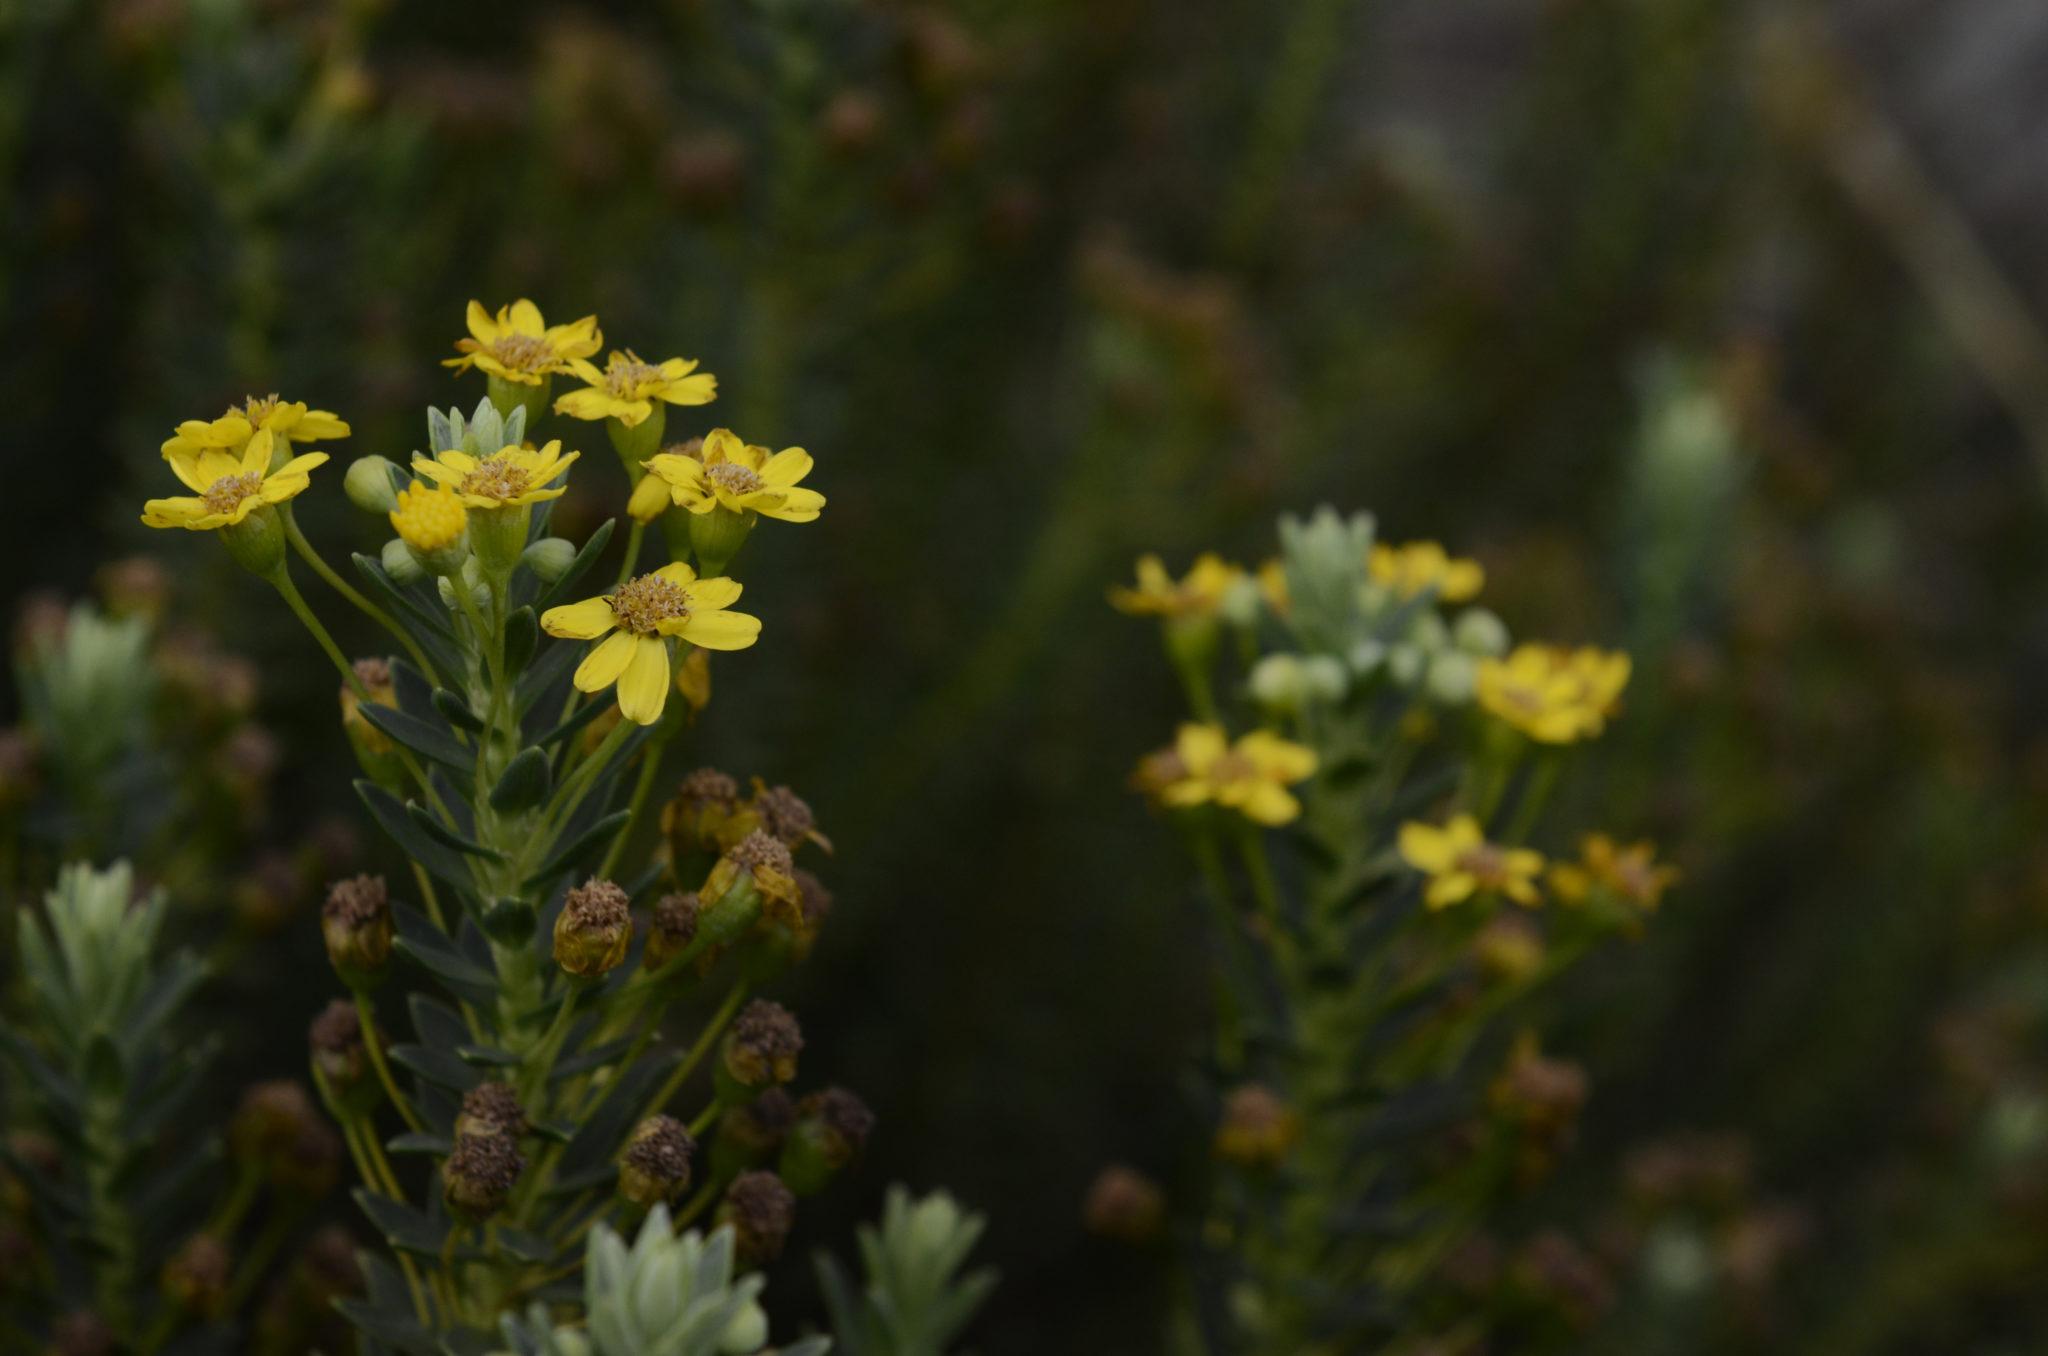 Blumen in den Drakensbergen in Südafrika